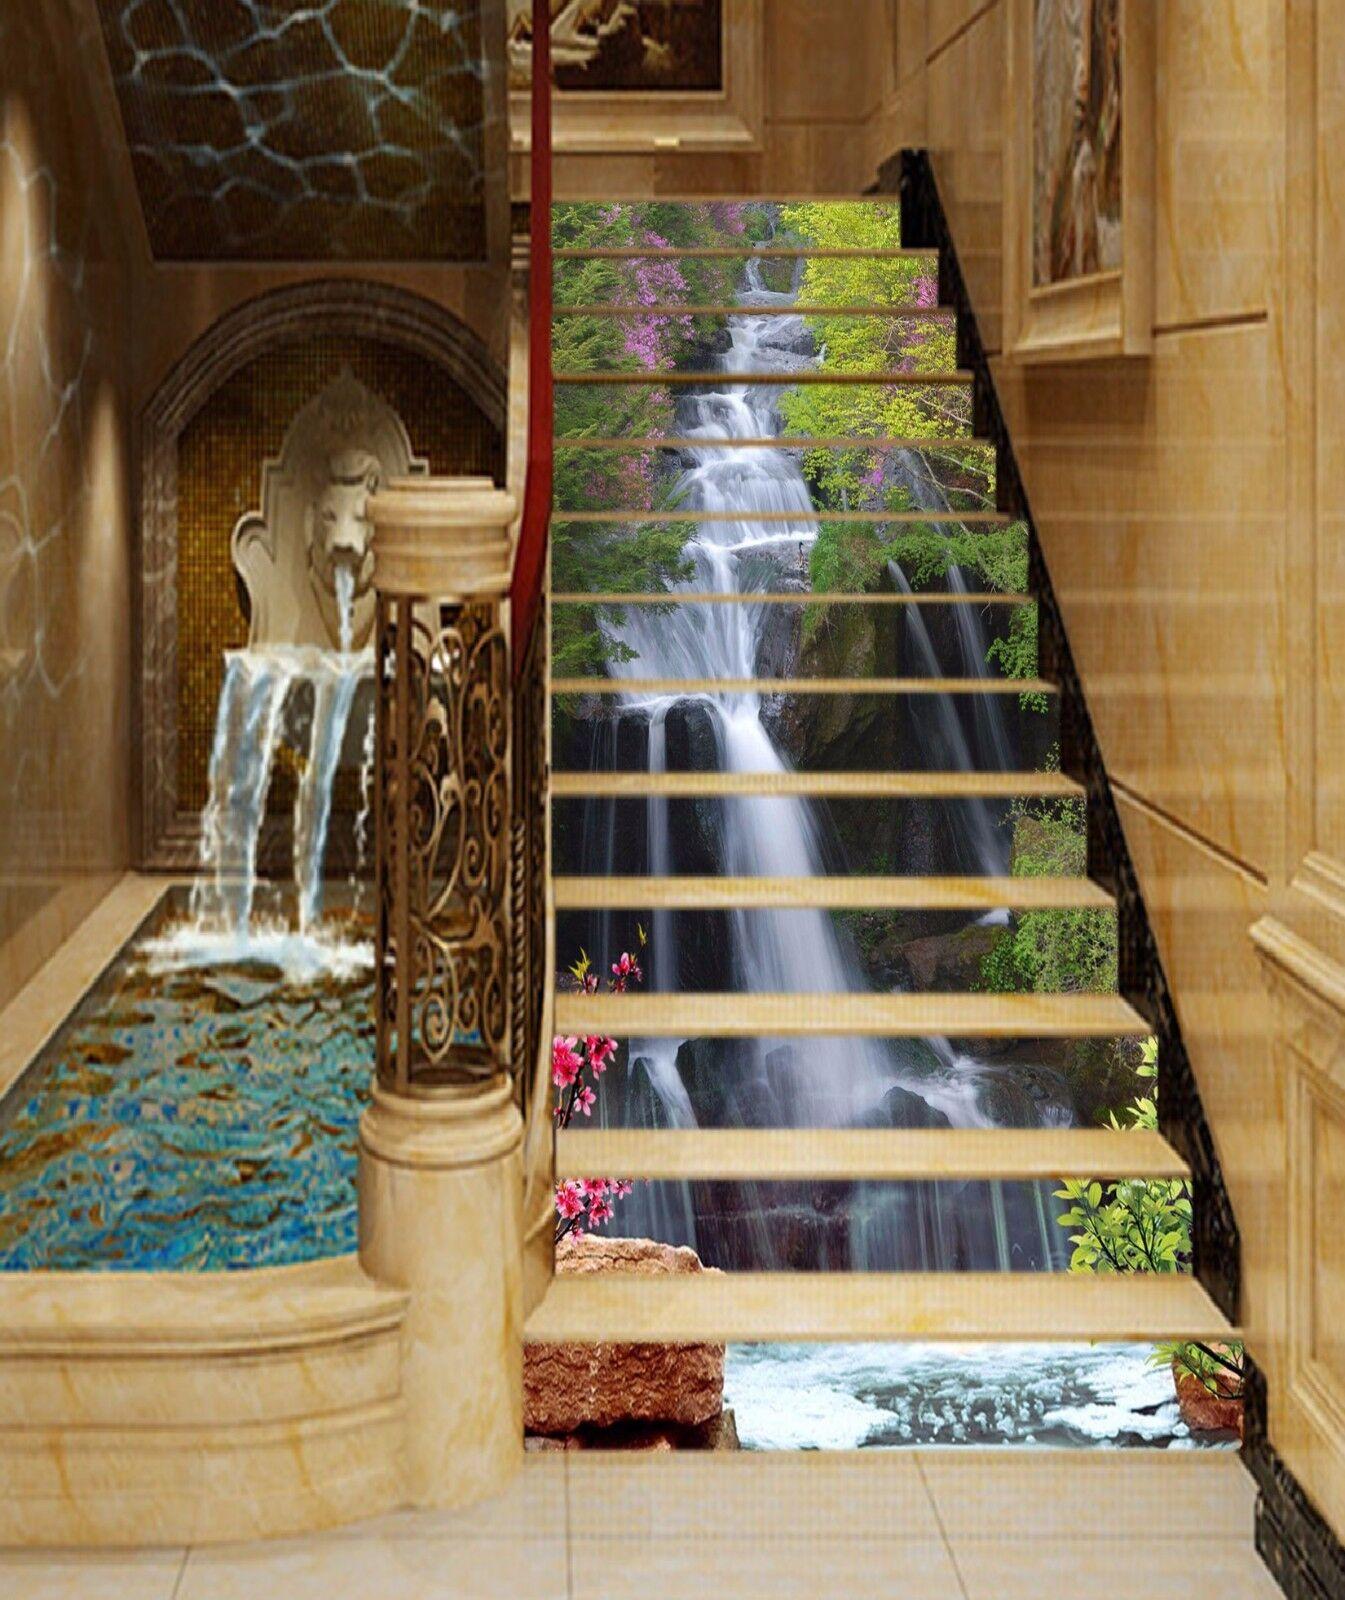 3D Nice Creek 043 Stairs Risers Decoration Photo Mural Vinyl Decal WandPapier US